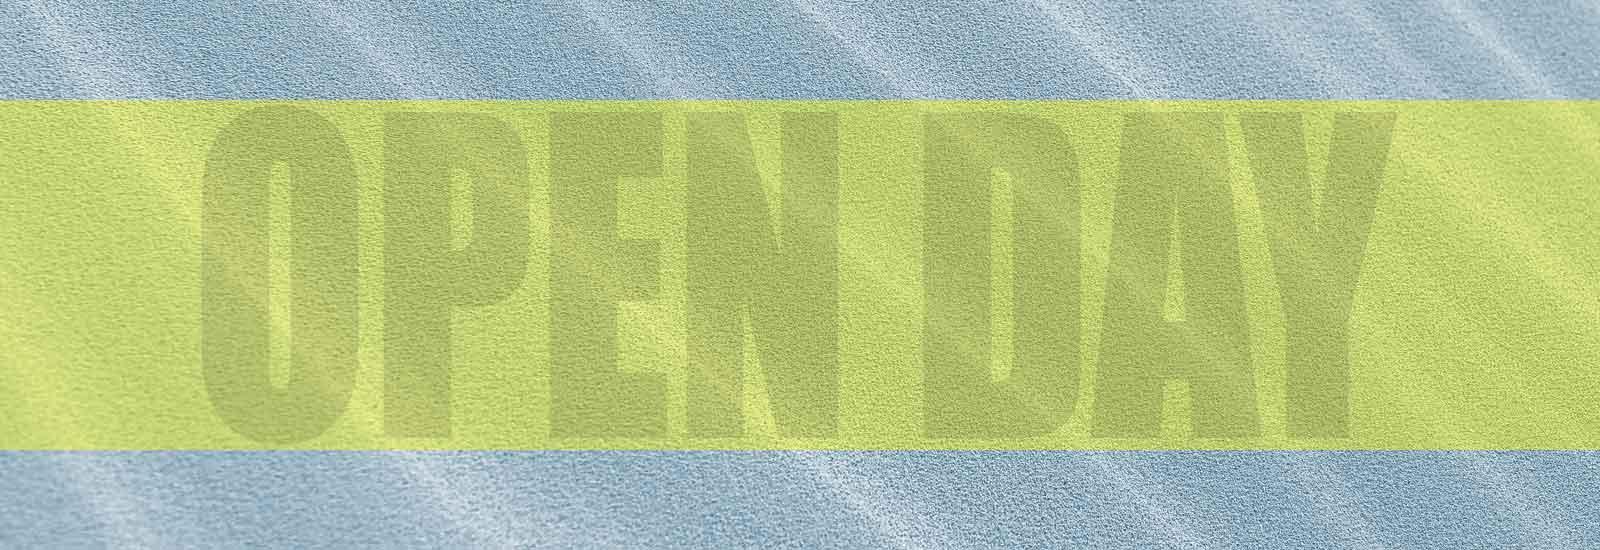 OPENDAY-BG-SLIDER